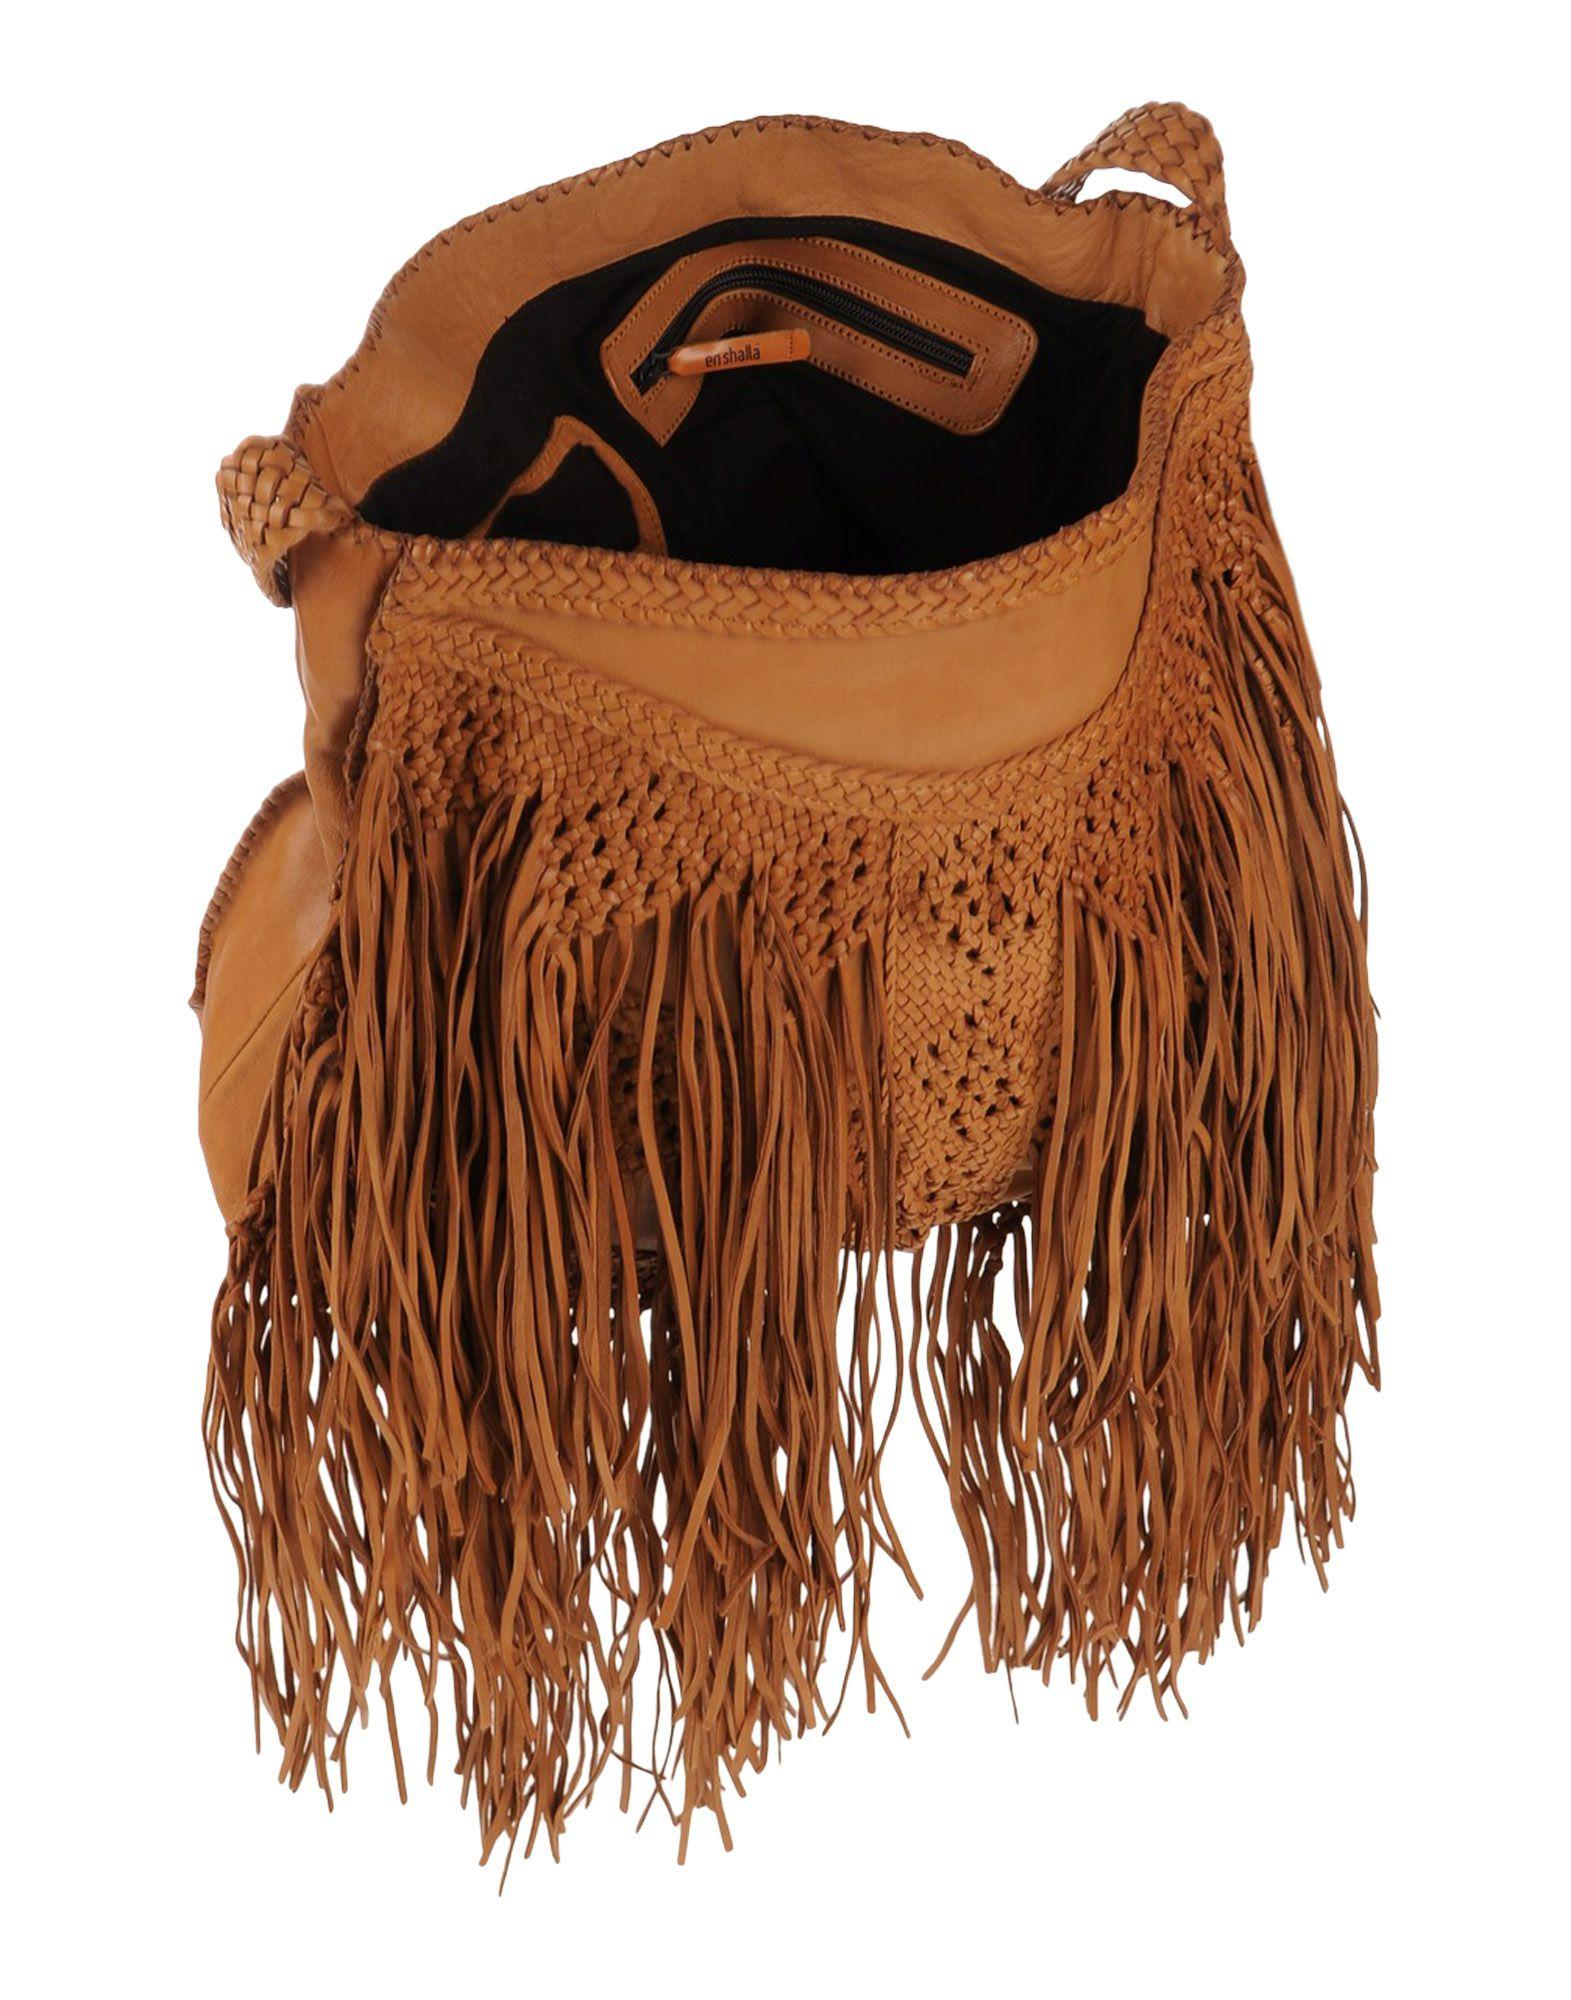 En Shalla Leather Cross-body Bag in Tan (Brown)